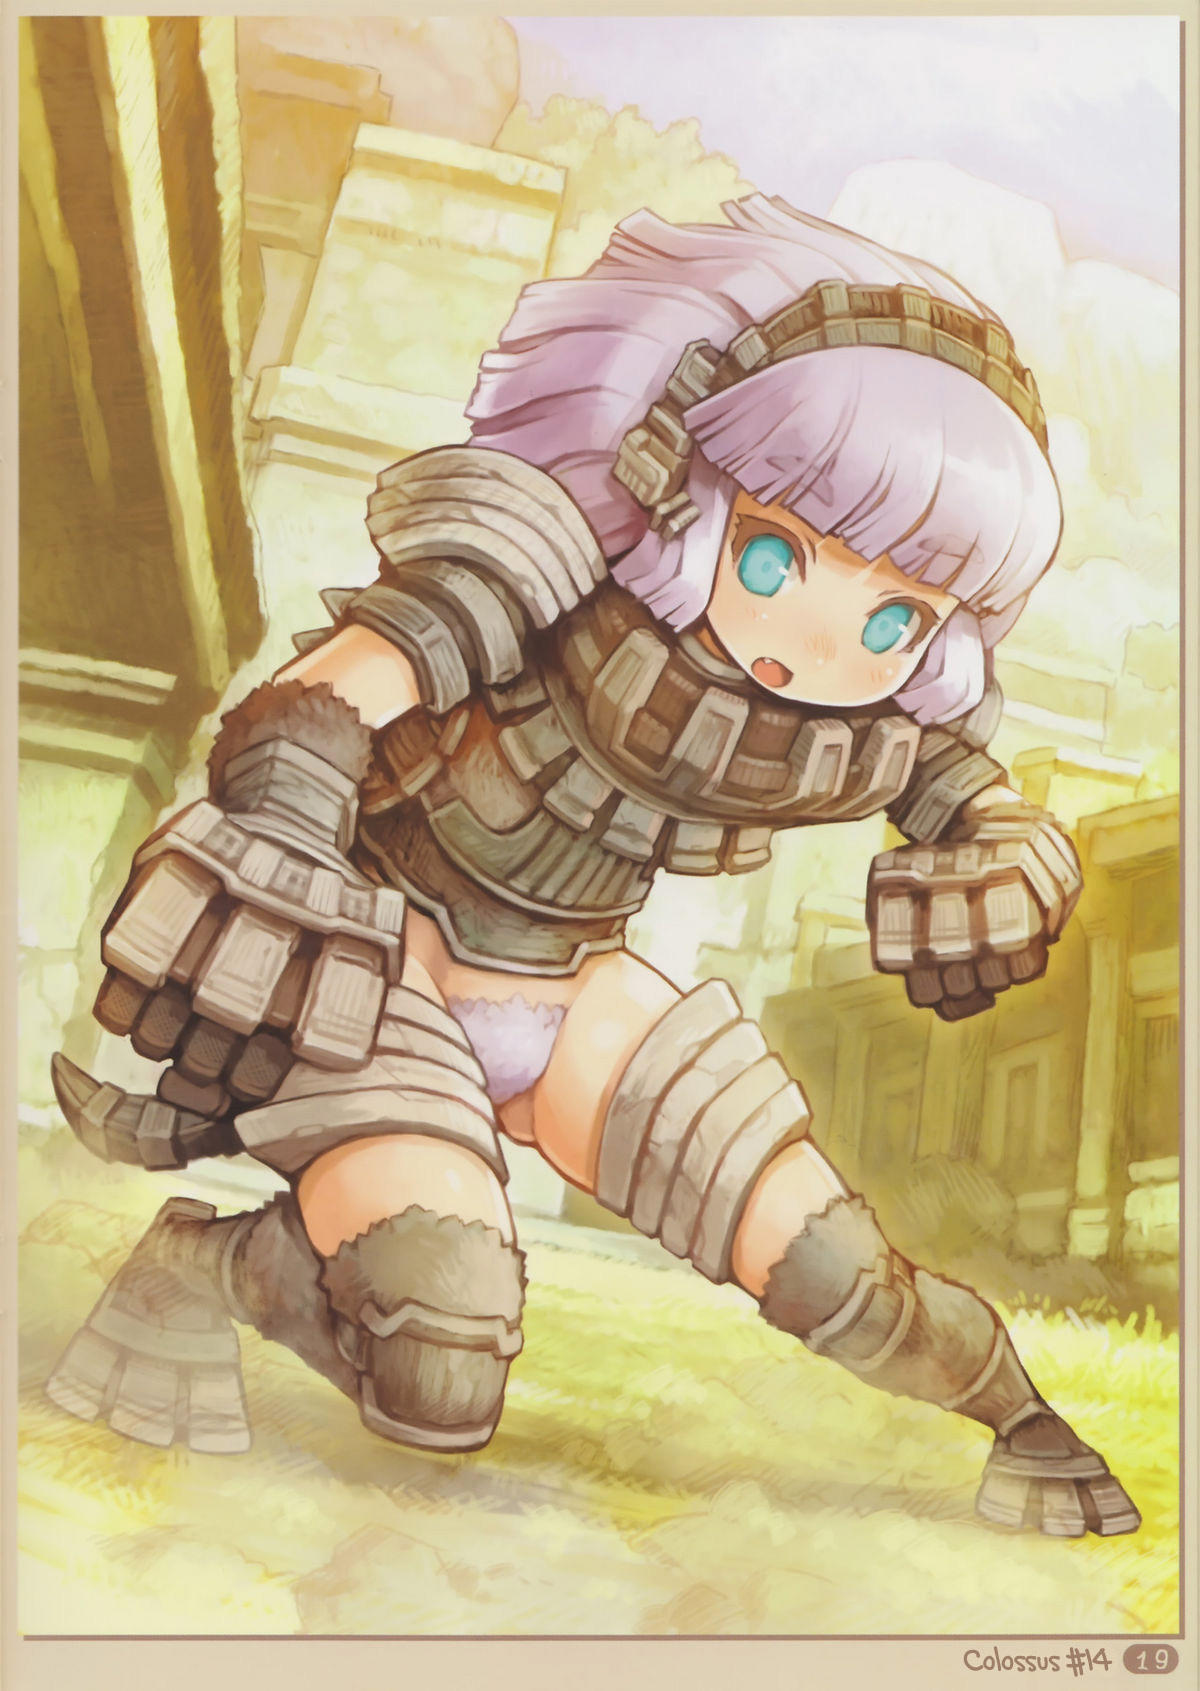 Moe Anime Girl Wallpaper Colossal Girl 14 Rule 34 Know Your Meme